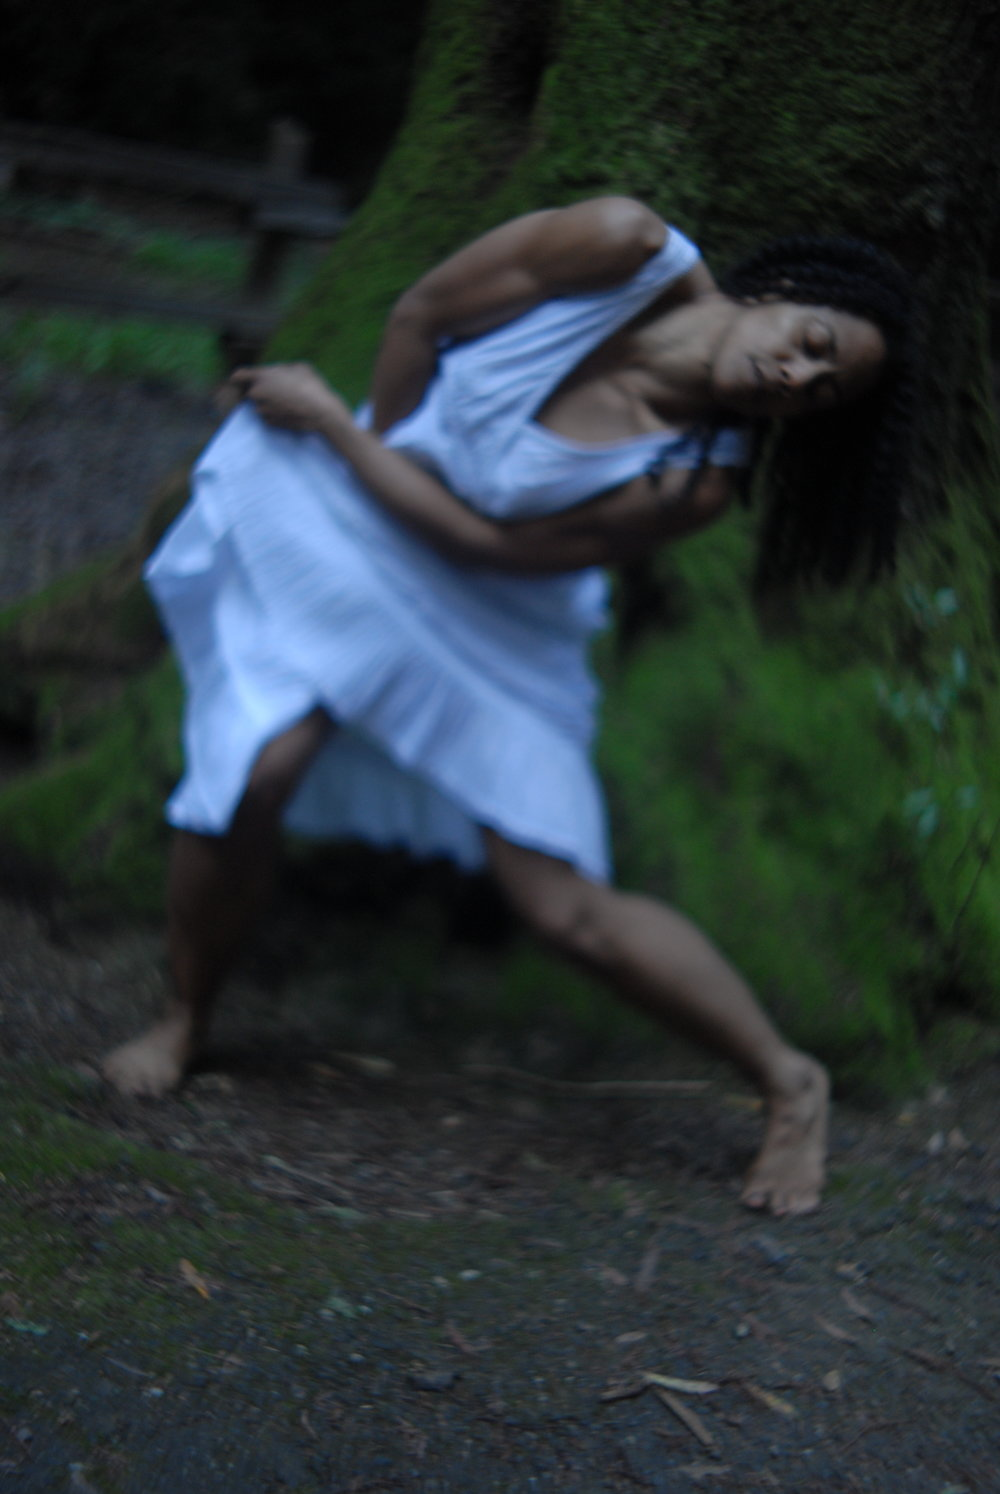 Amara Tabor-Smith